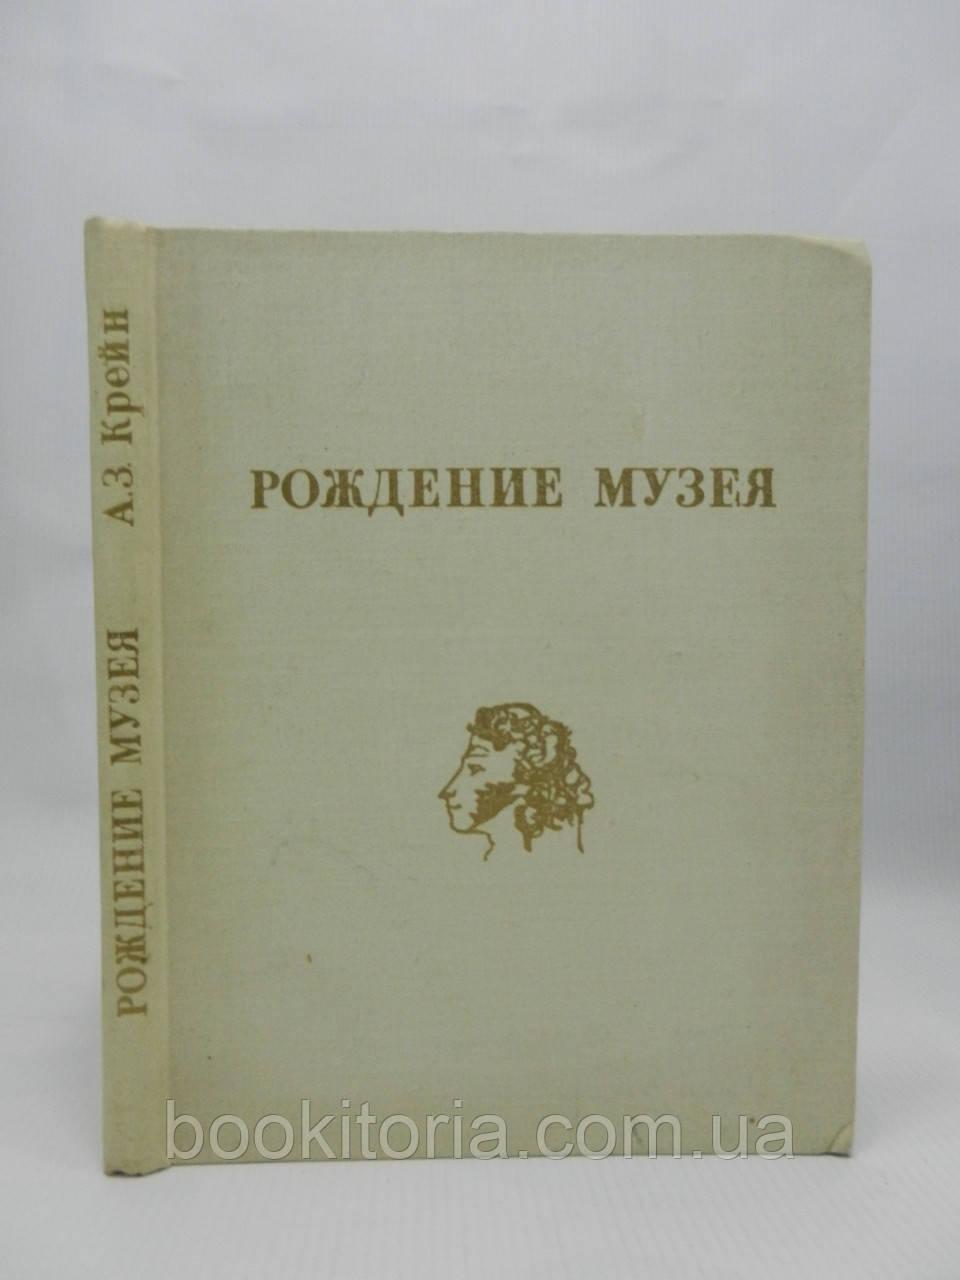 Крейн А.З. Рождение музея (б/у).